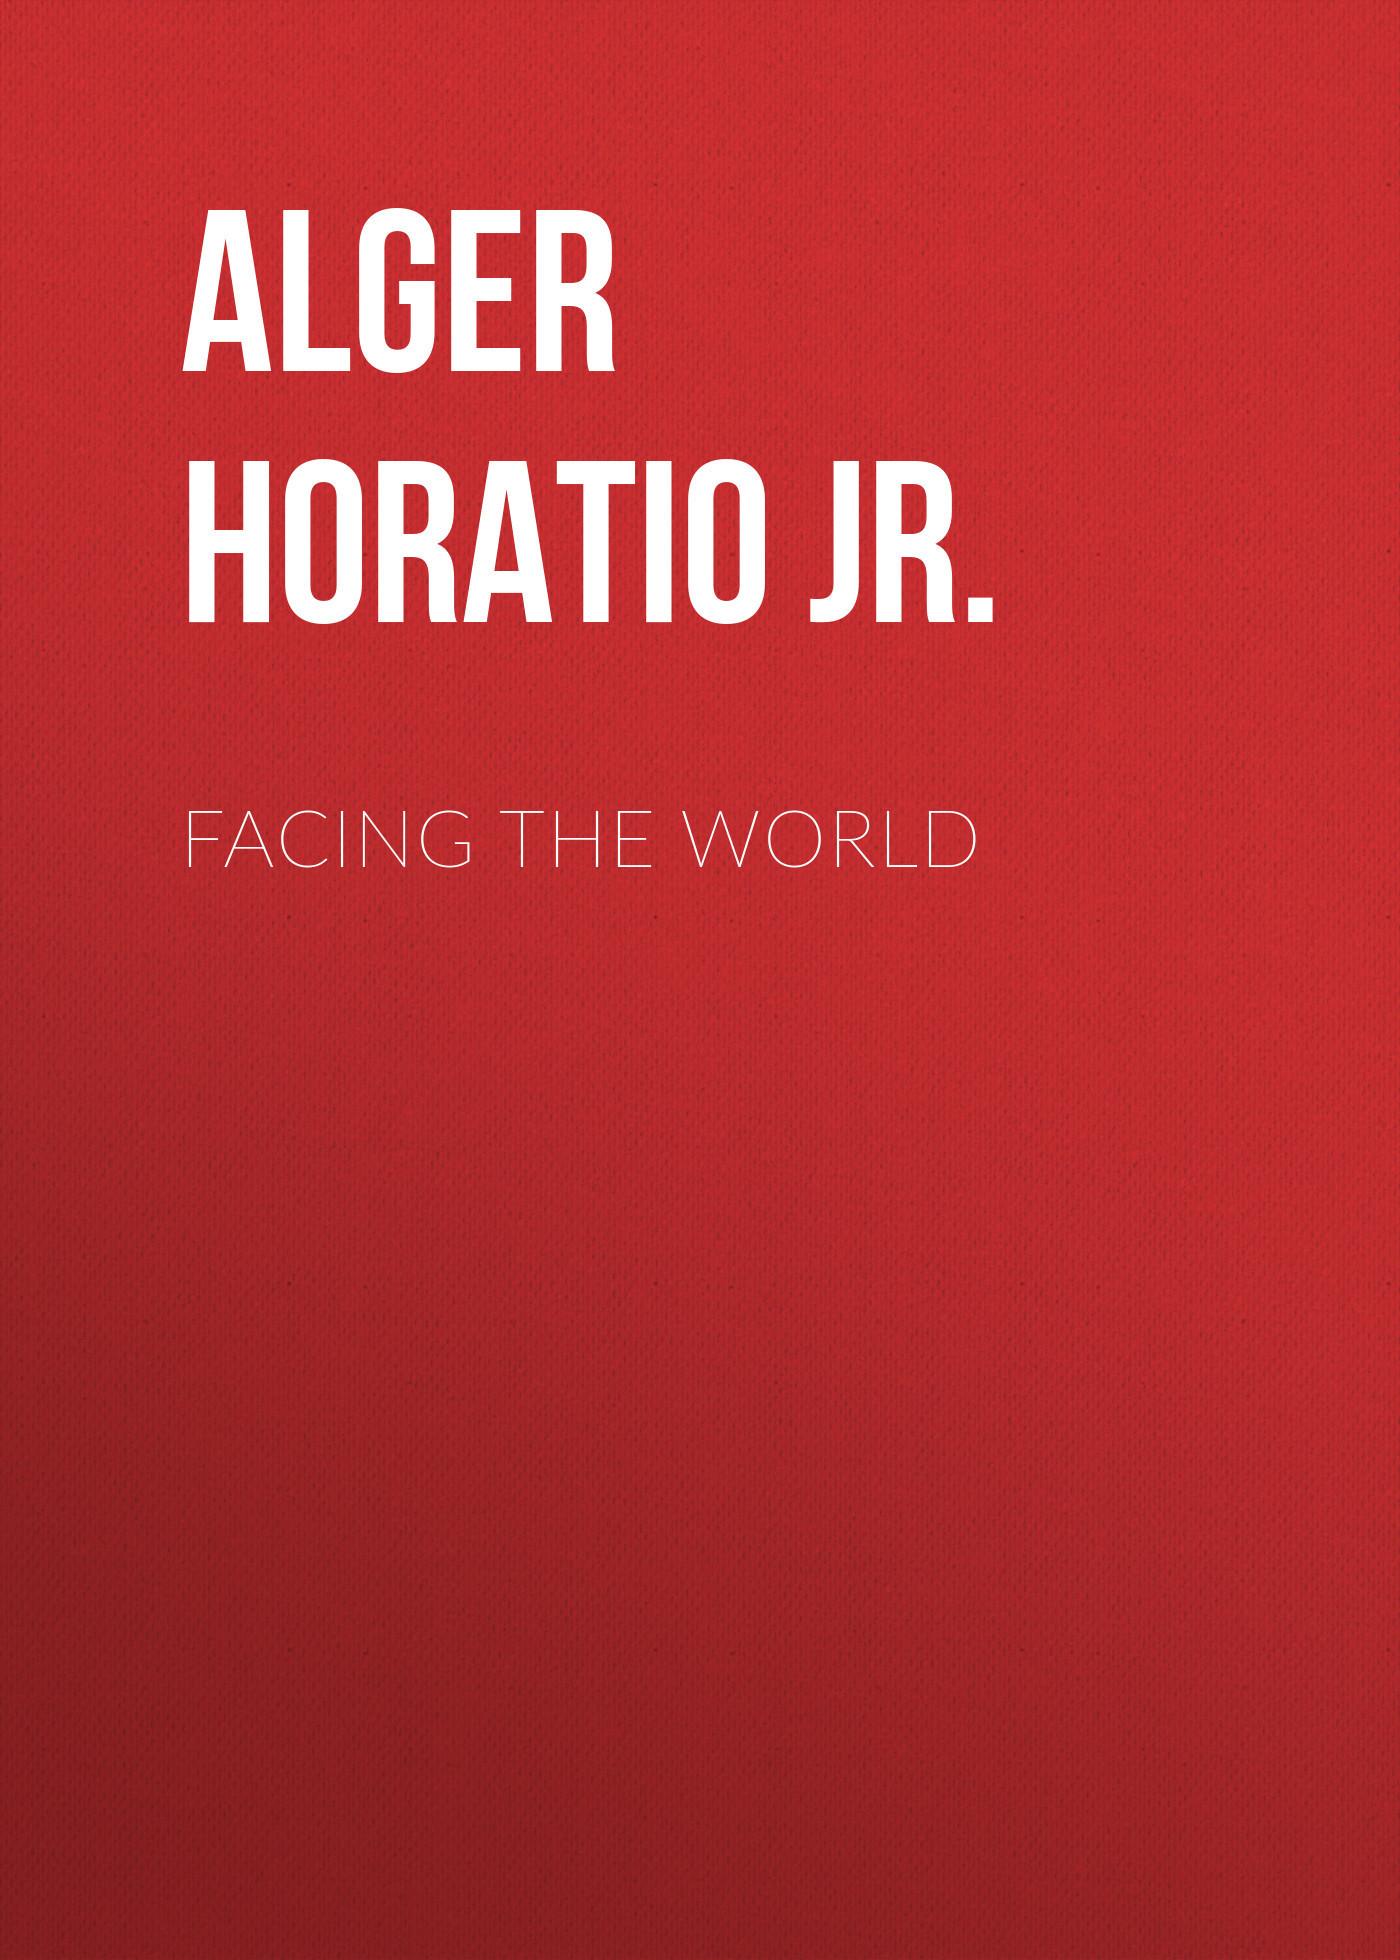 Alger Horatio Jr. Facing the World horatio alger jr bernard brooks adventures the experience of a plucky boy